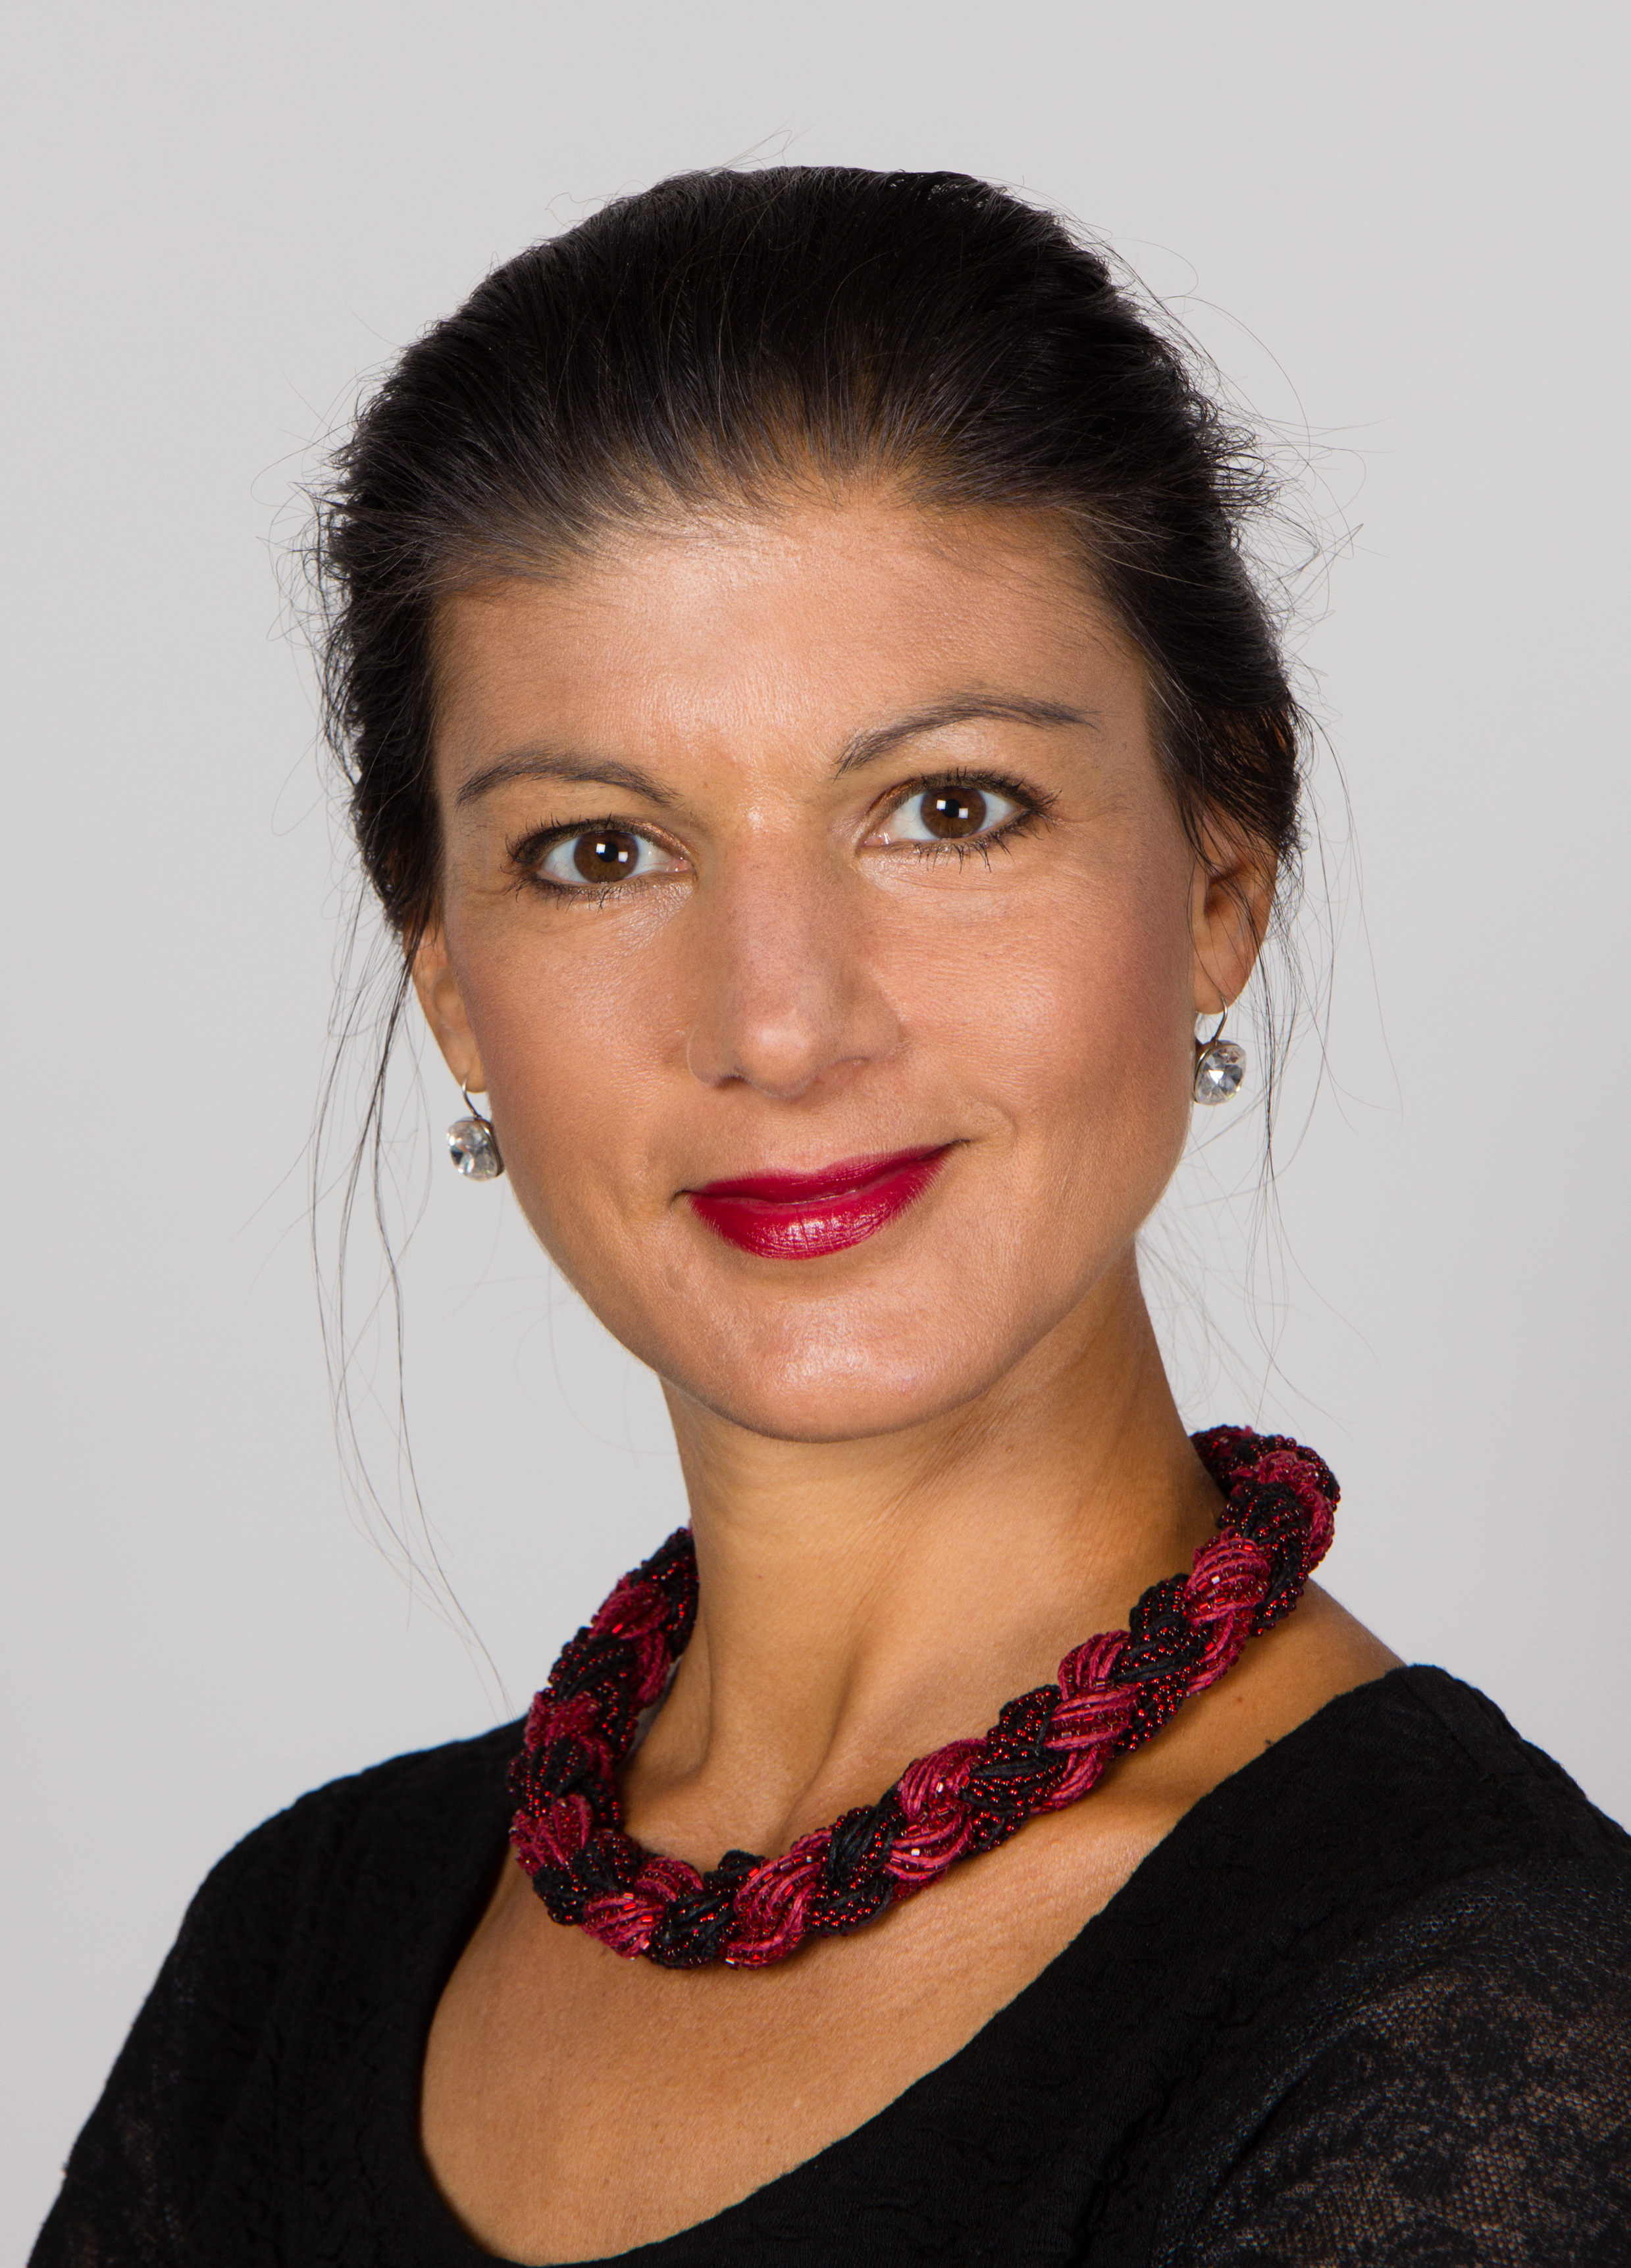 Sahra Wagenknecht - Wikipedia, the free encyclopedia